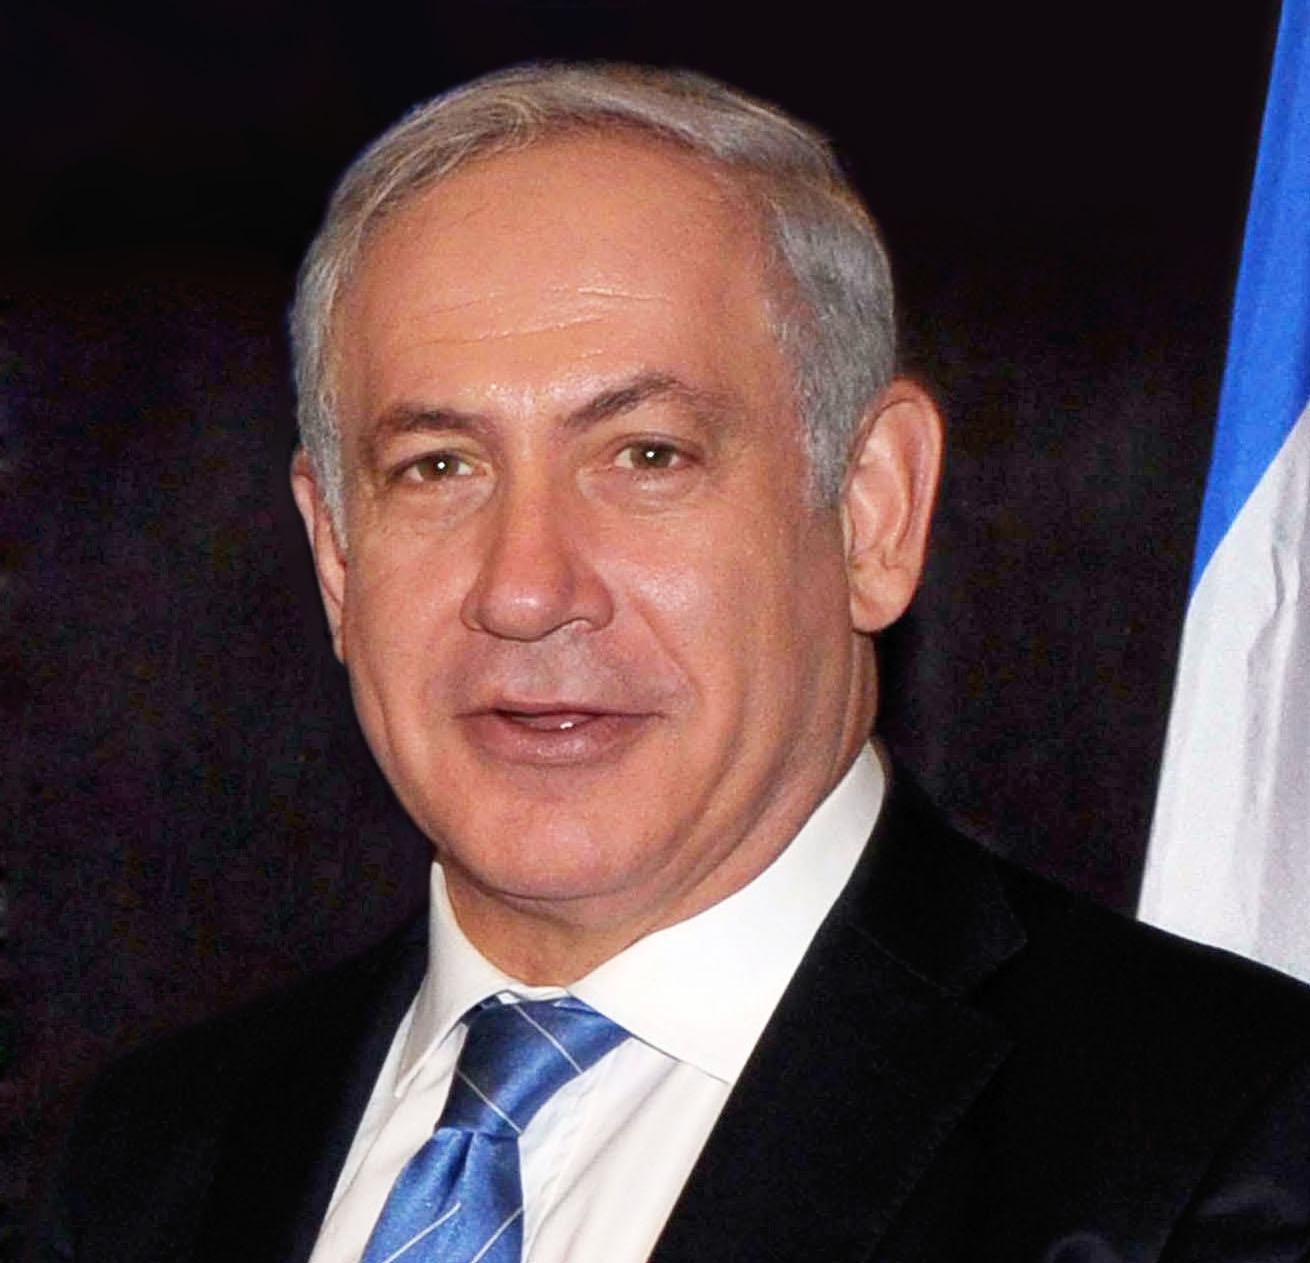 https://i2.wp.com/www.chiourim.com/wp-content/uploads/2015/02/Benjamin_Netanyahu_portrait-1.jpg